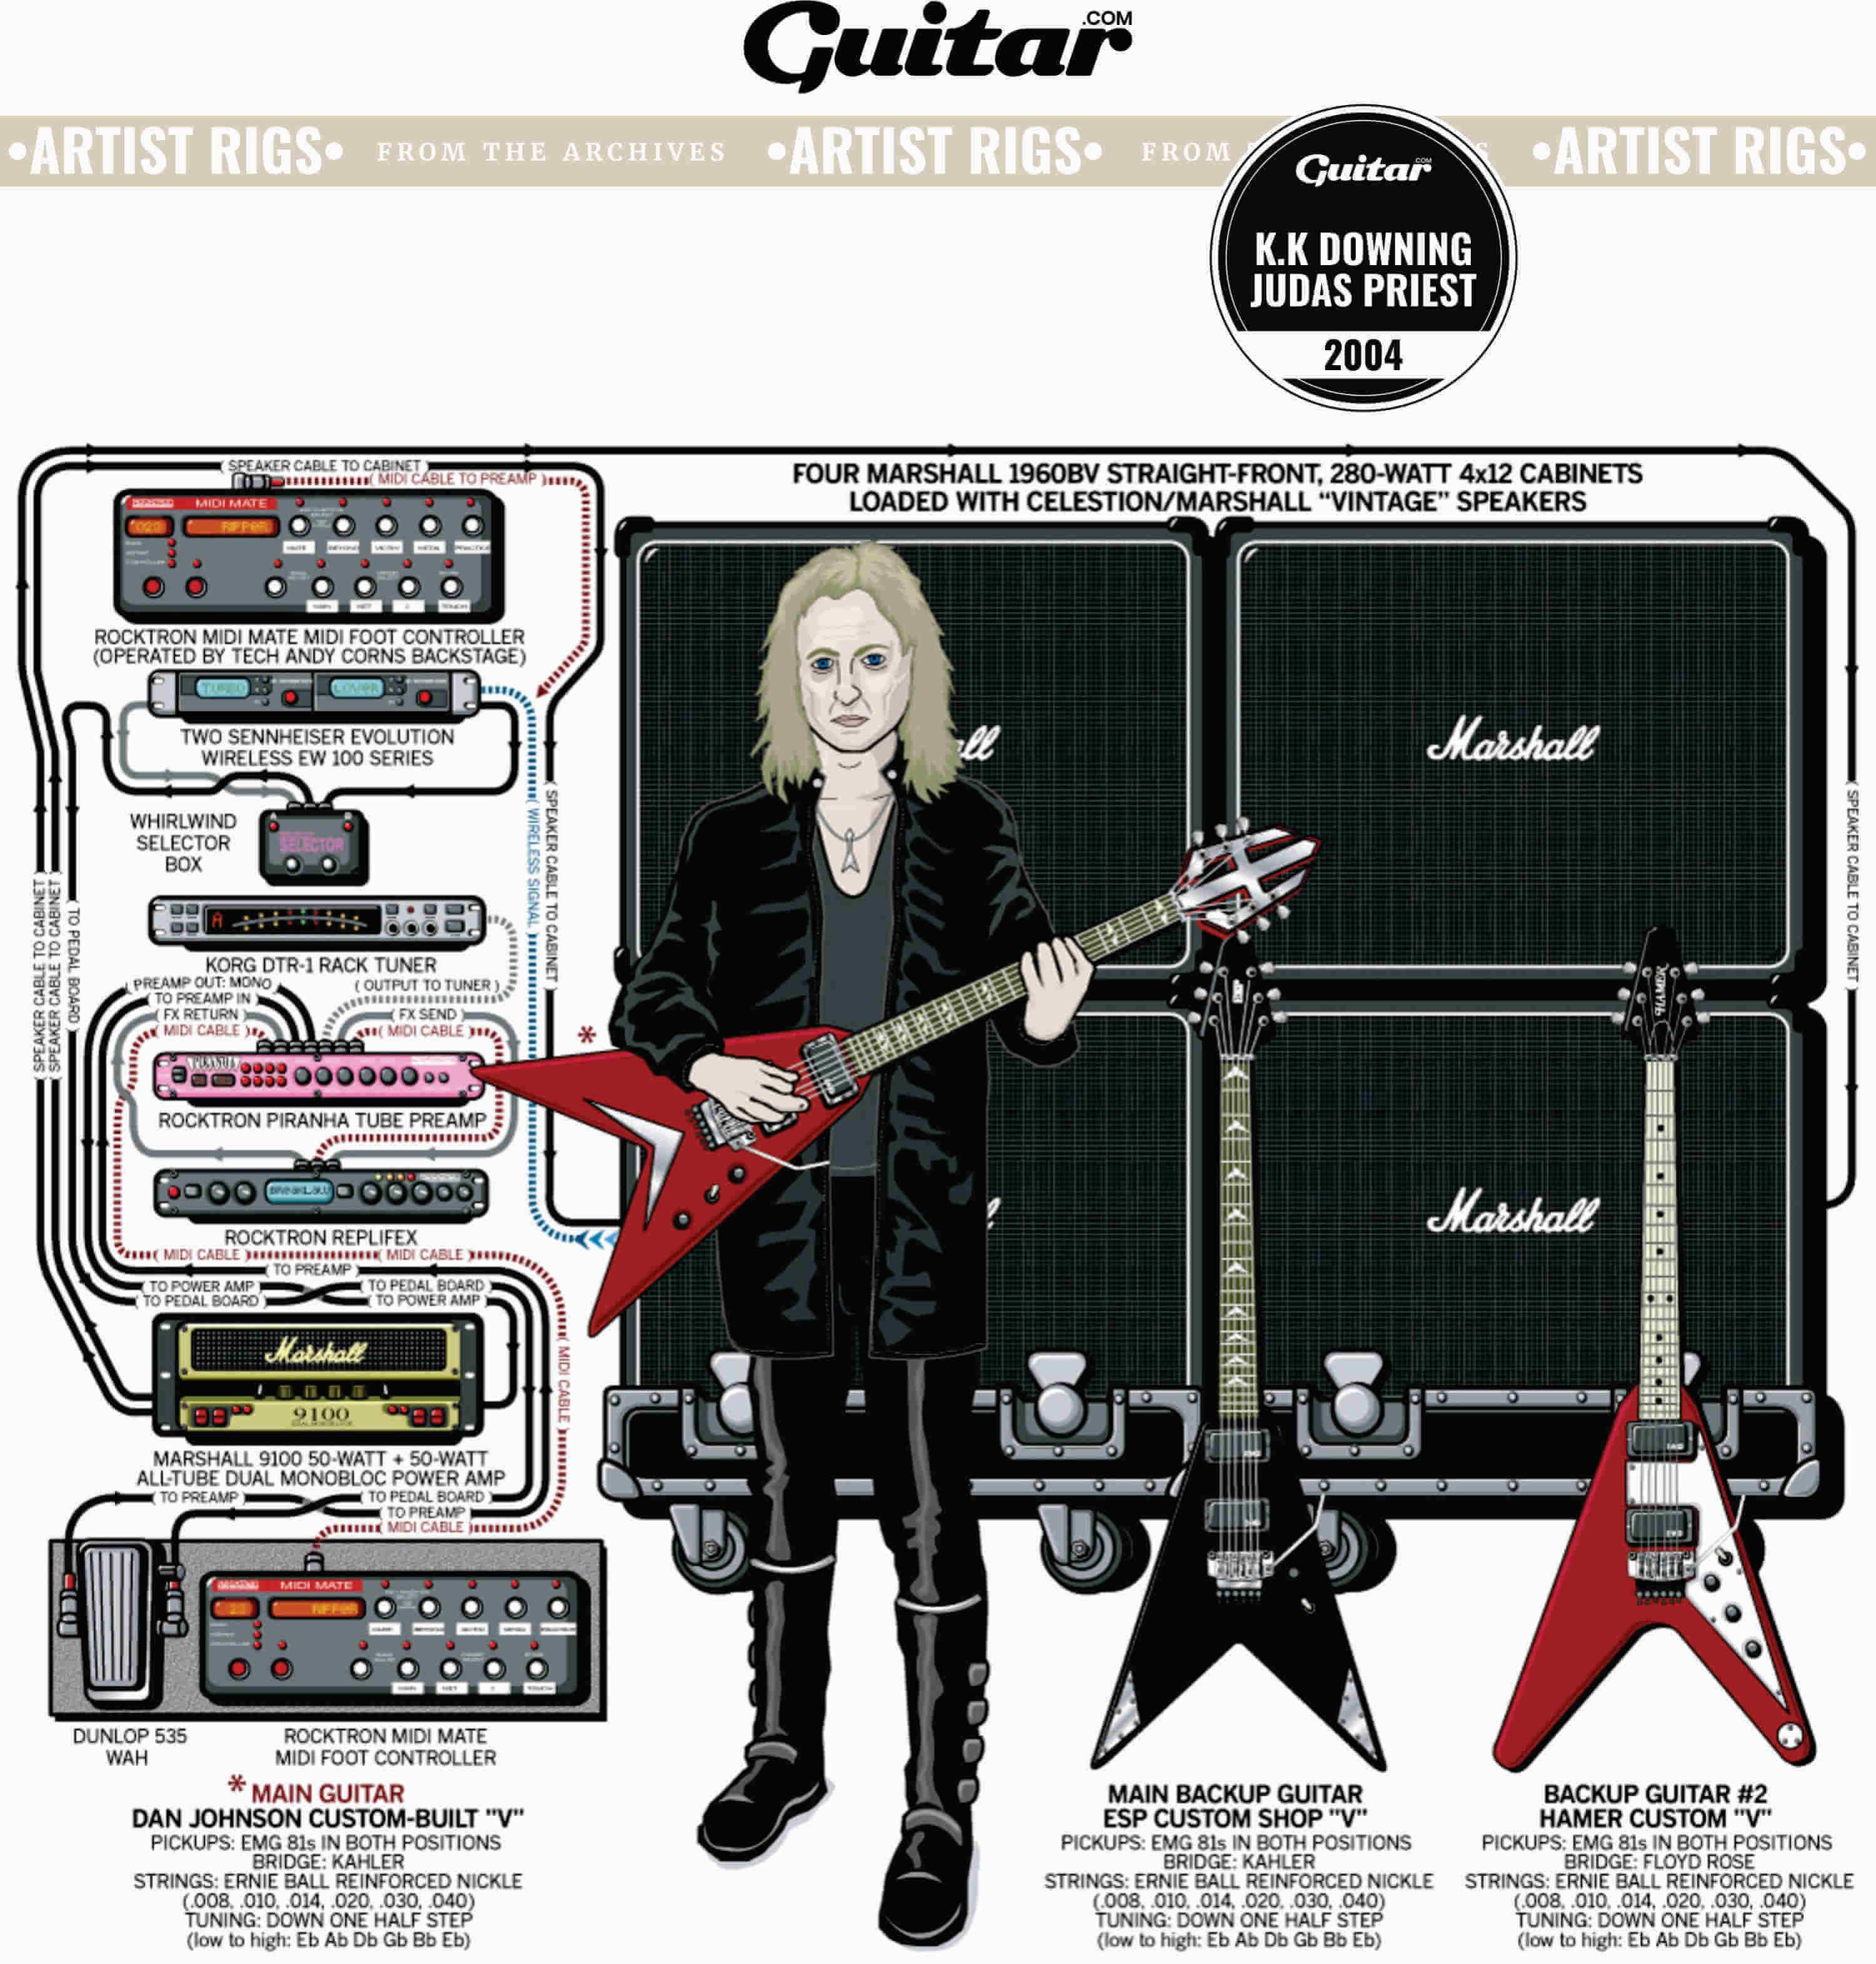 Rig Diagram: K.K Downing, Judas Priest (2004)